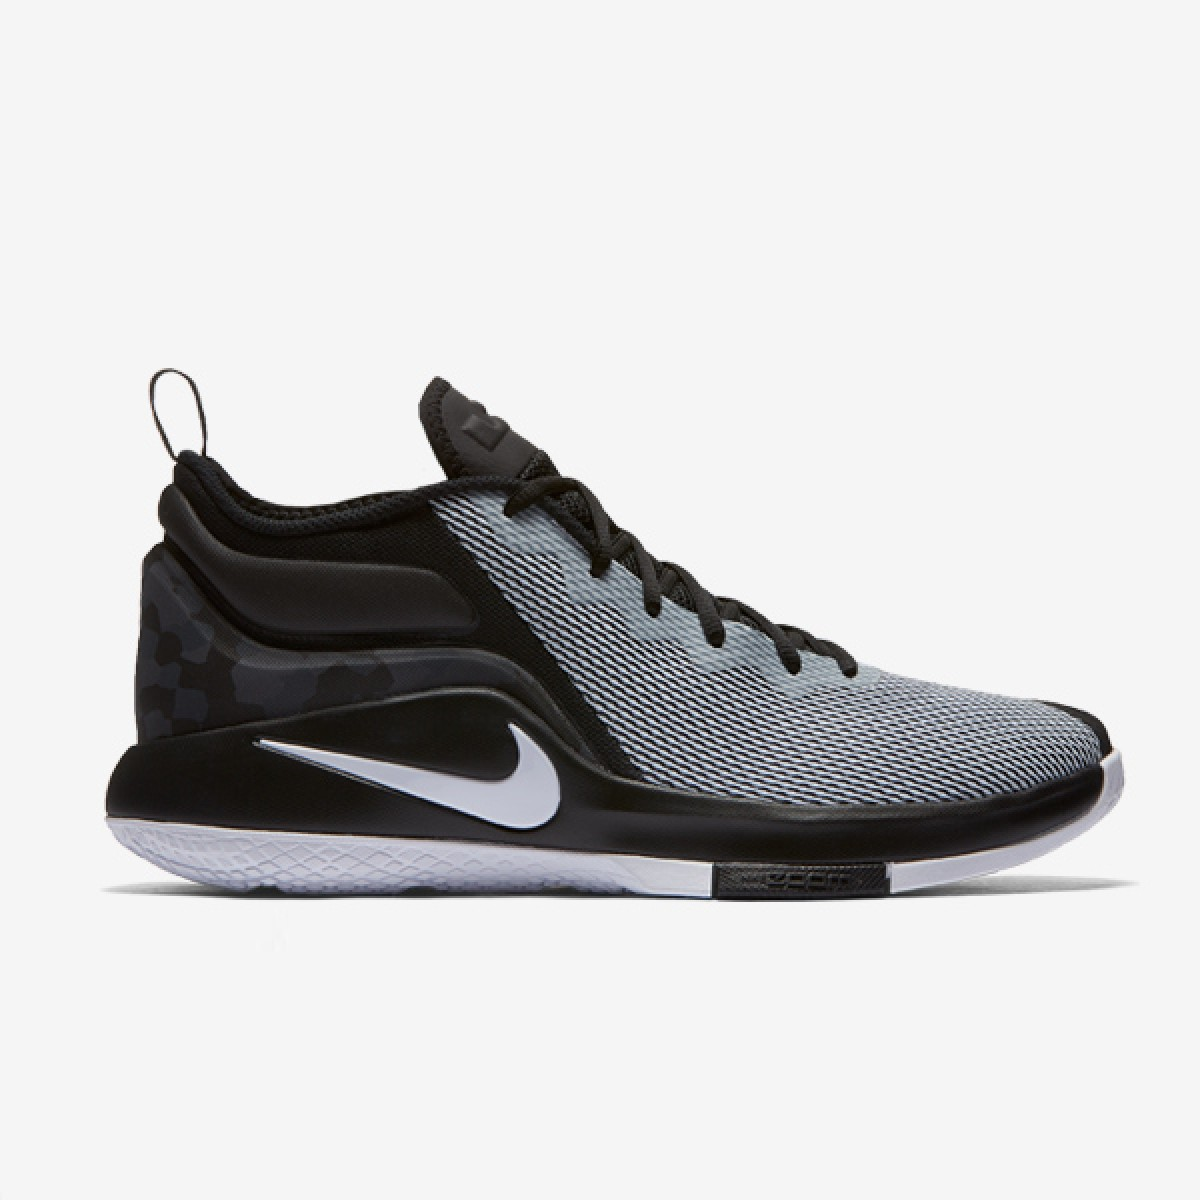 Nike Lebron Witness II 'B&W'